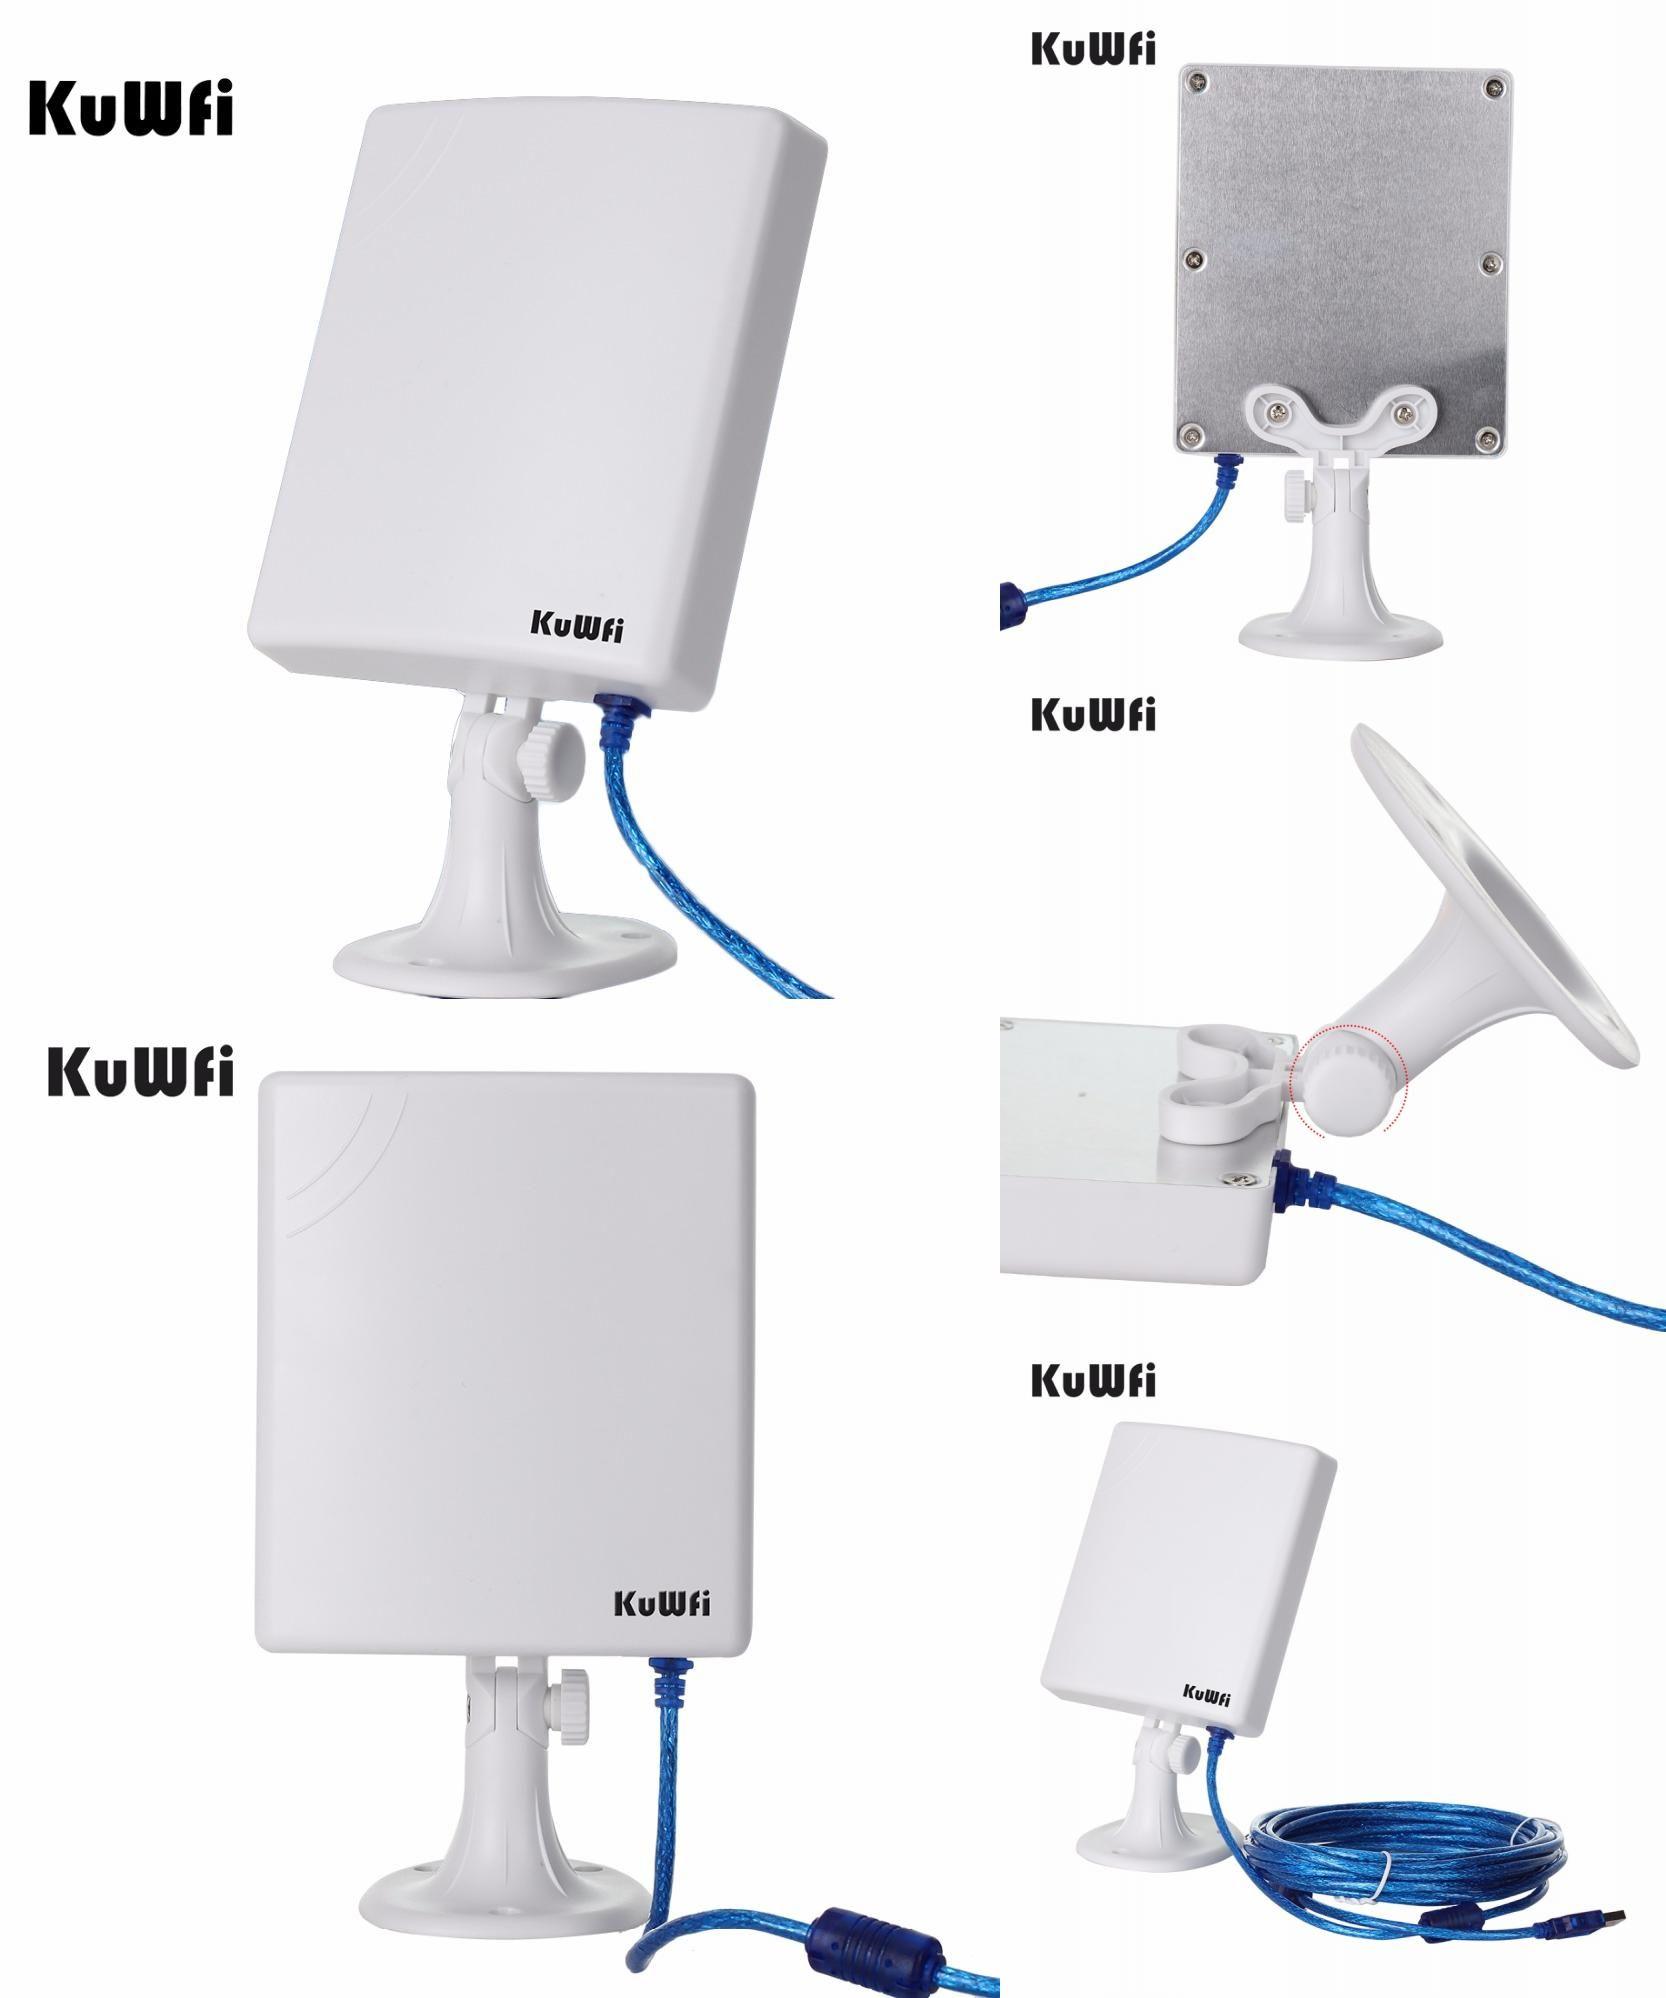 Visit To Buy Kuwfi 150mbps High Gain 14dbi Antenna 5m Cable Wireless Usb Adapter High Power Outdoor Waterproof 2 5km Long Range Wifi Receive Antenna Wifi Usb